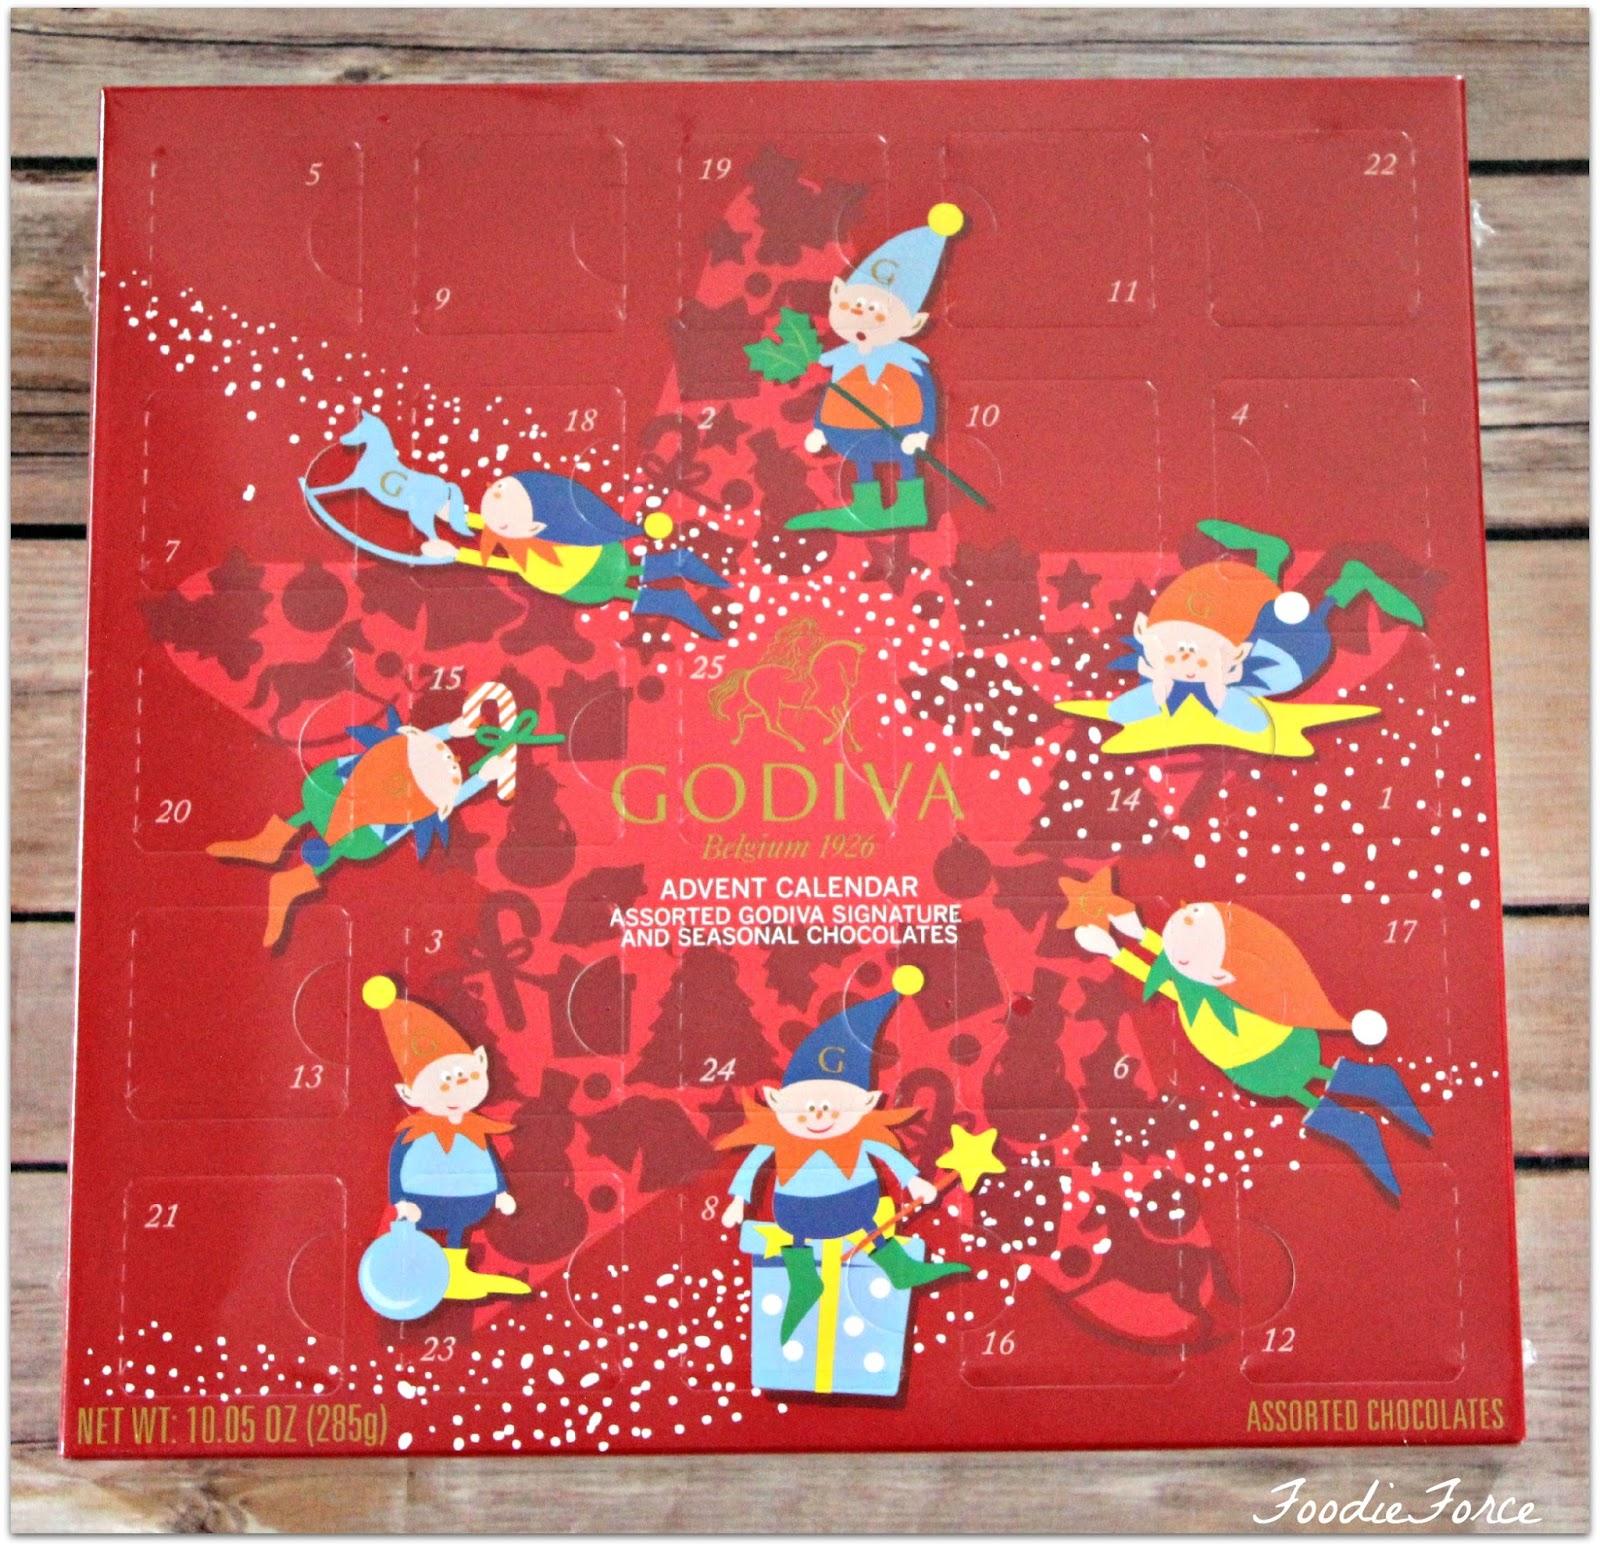 Godiva Advent Calendar.Foodie Force Top Christmas Advent Calendars 2015